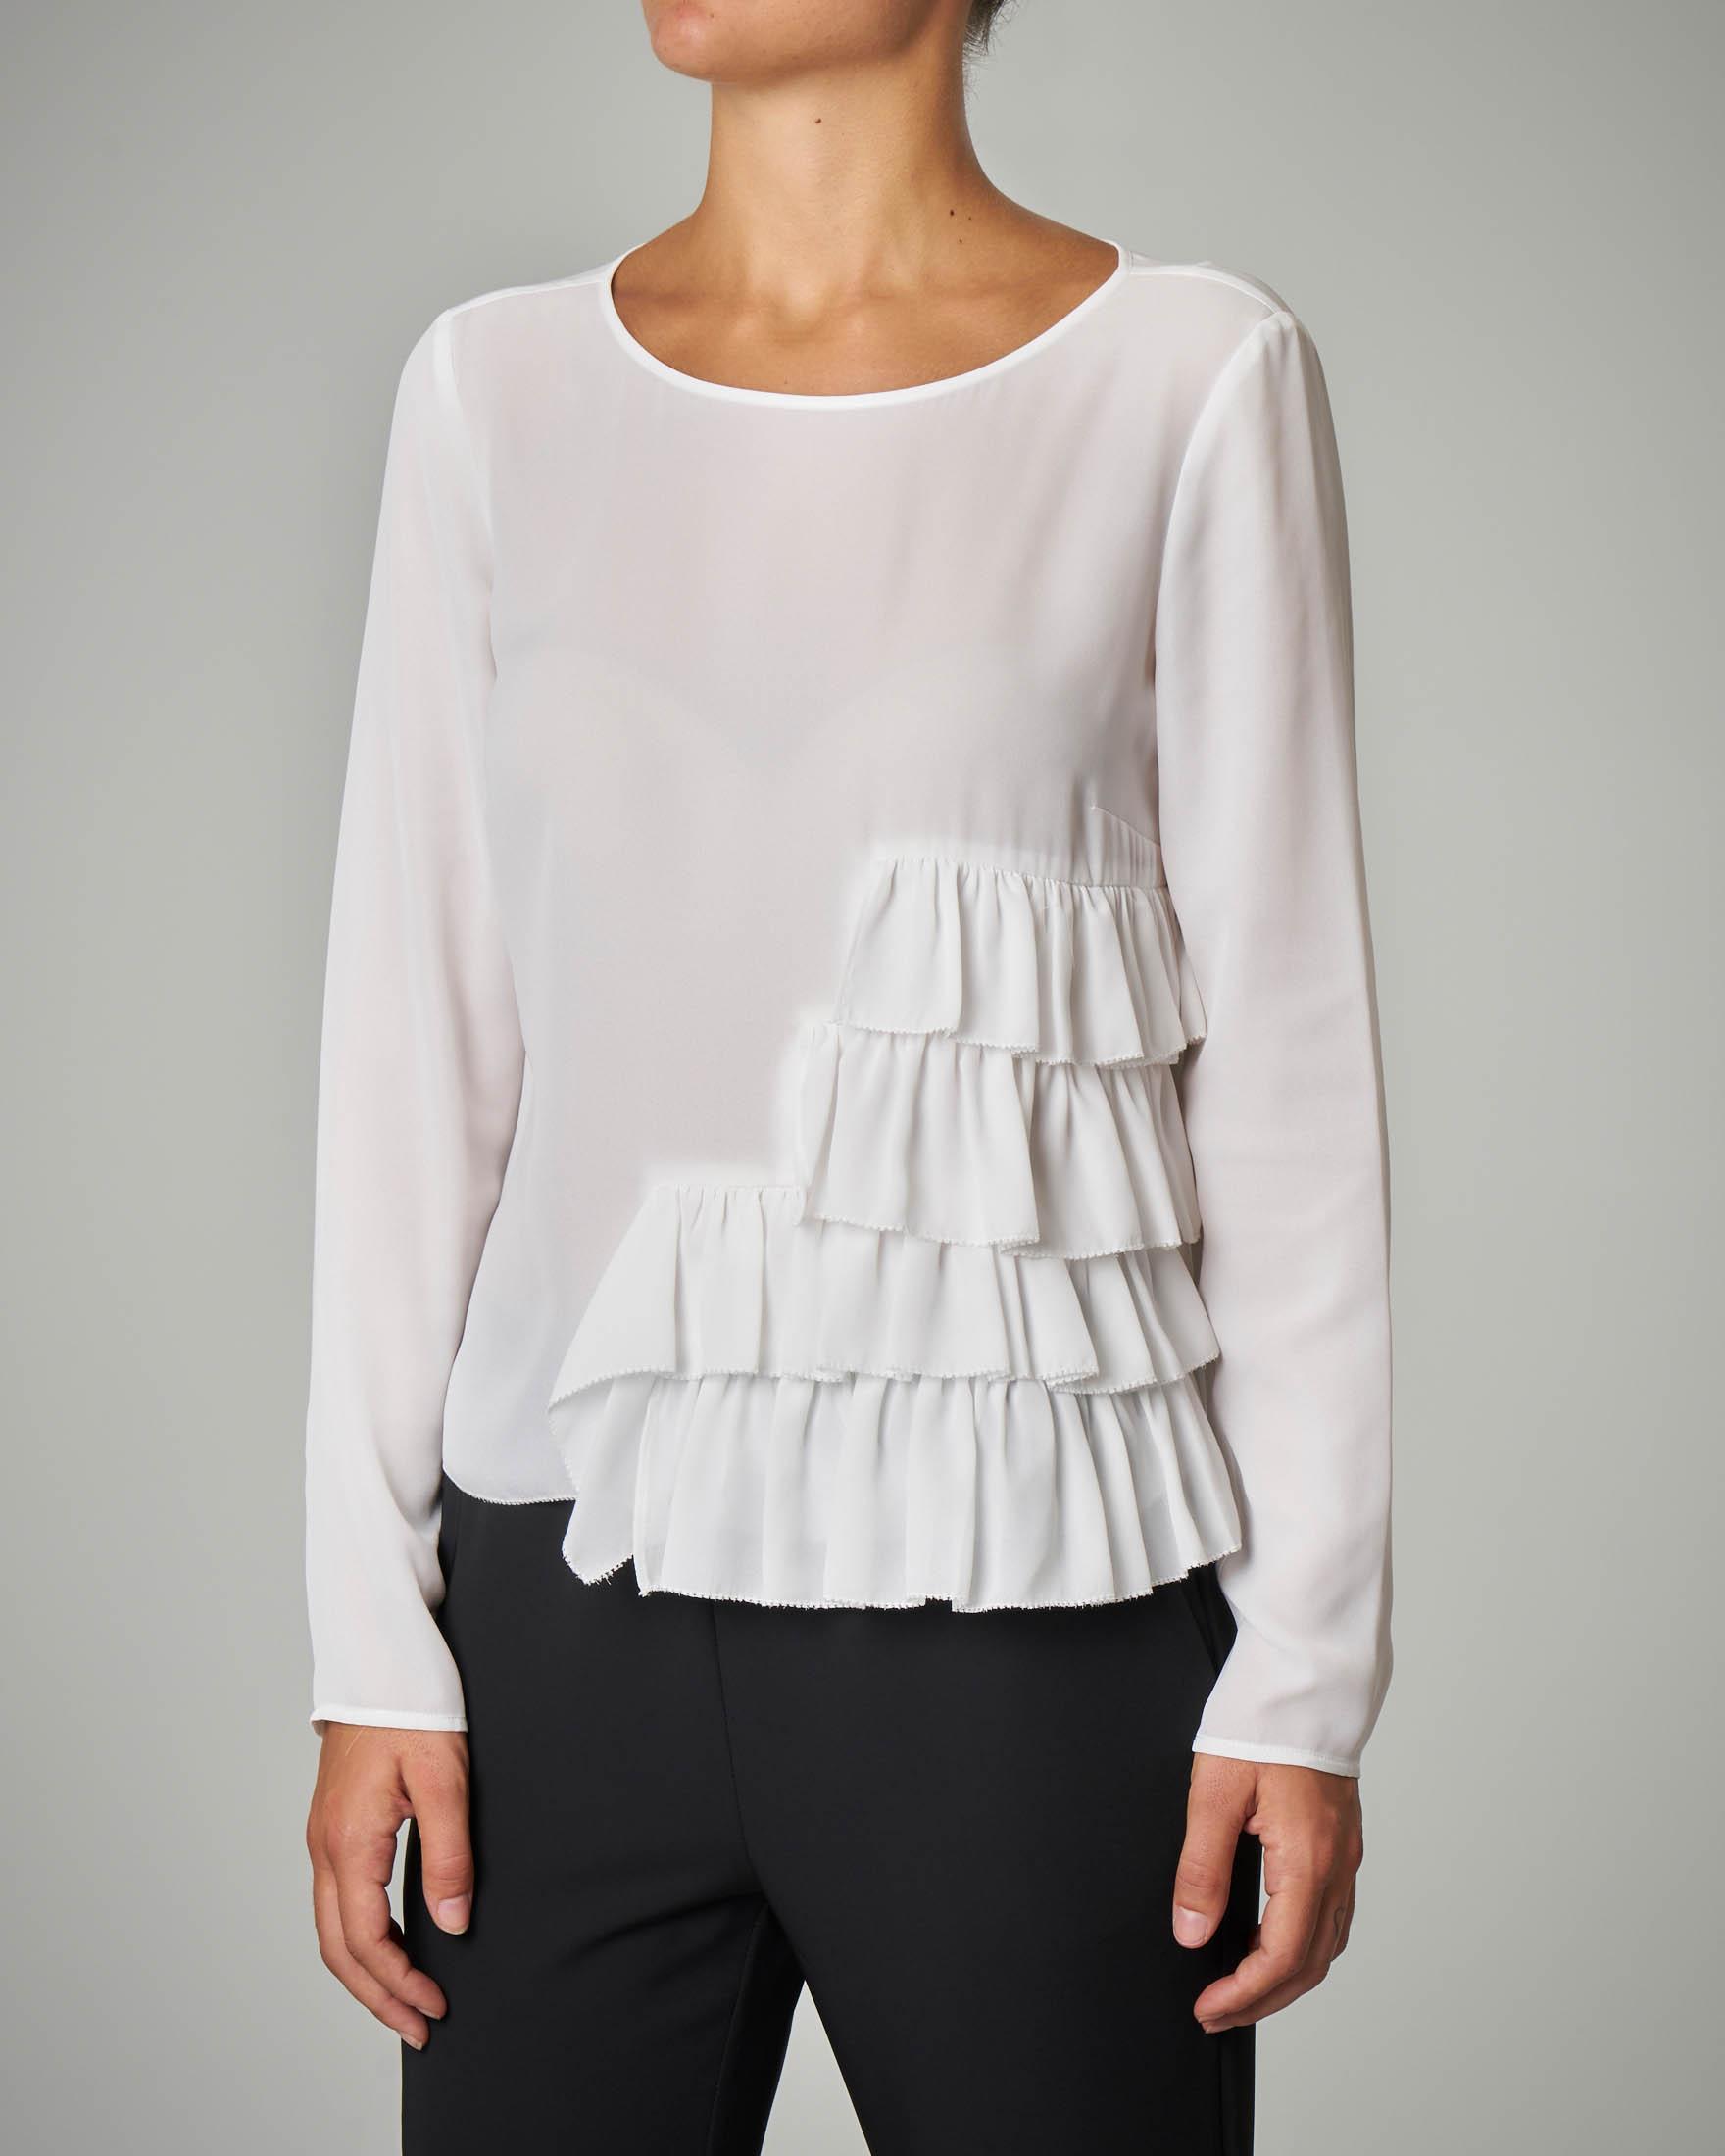 Blusa bianca con rouches